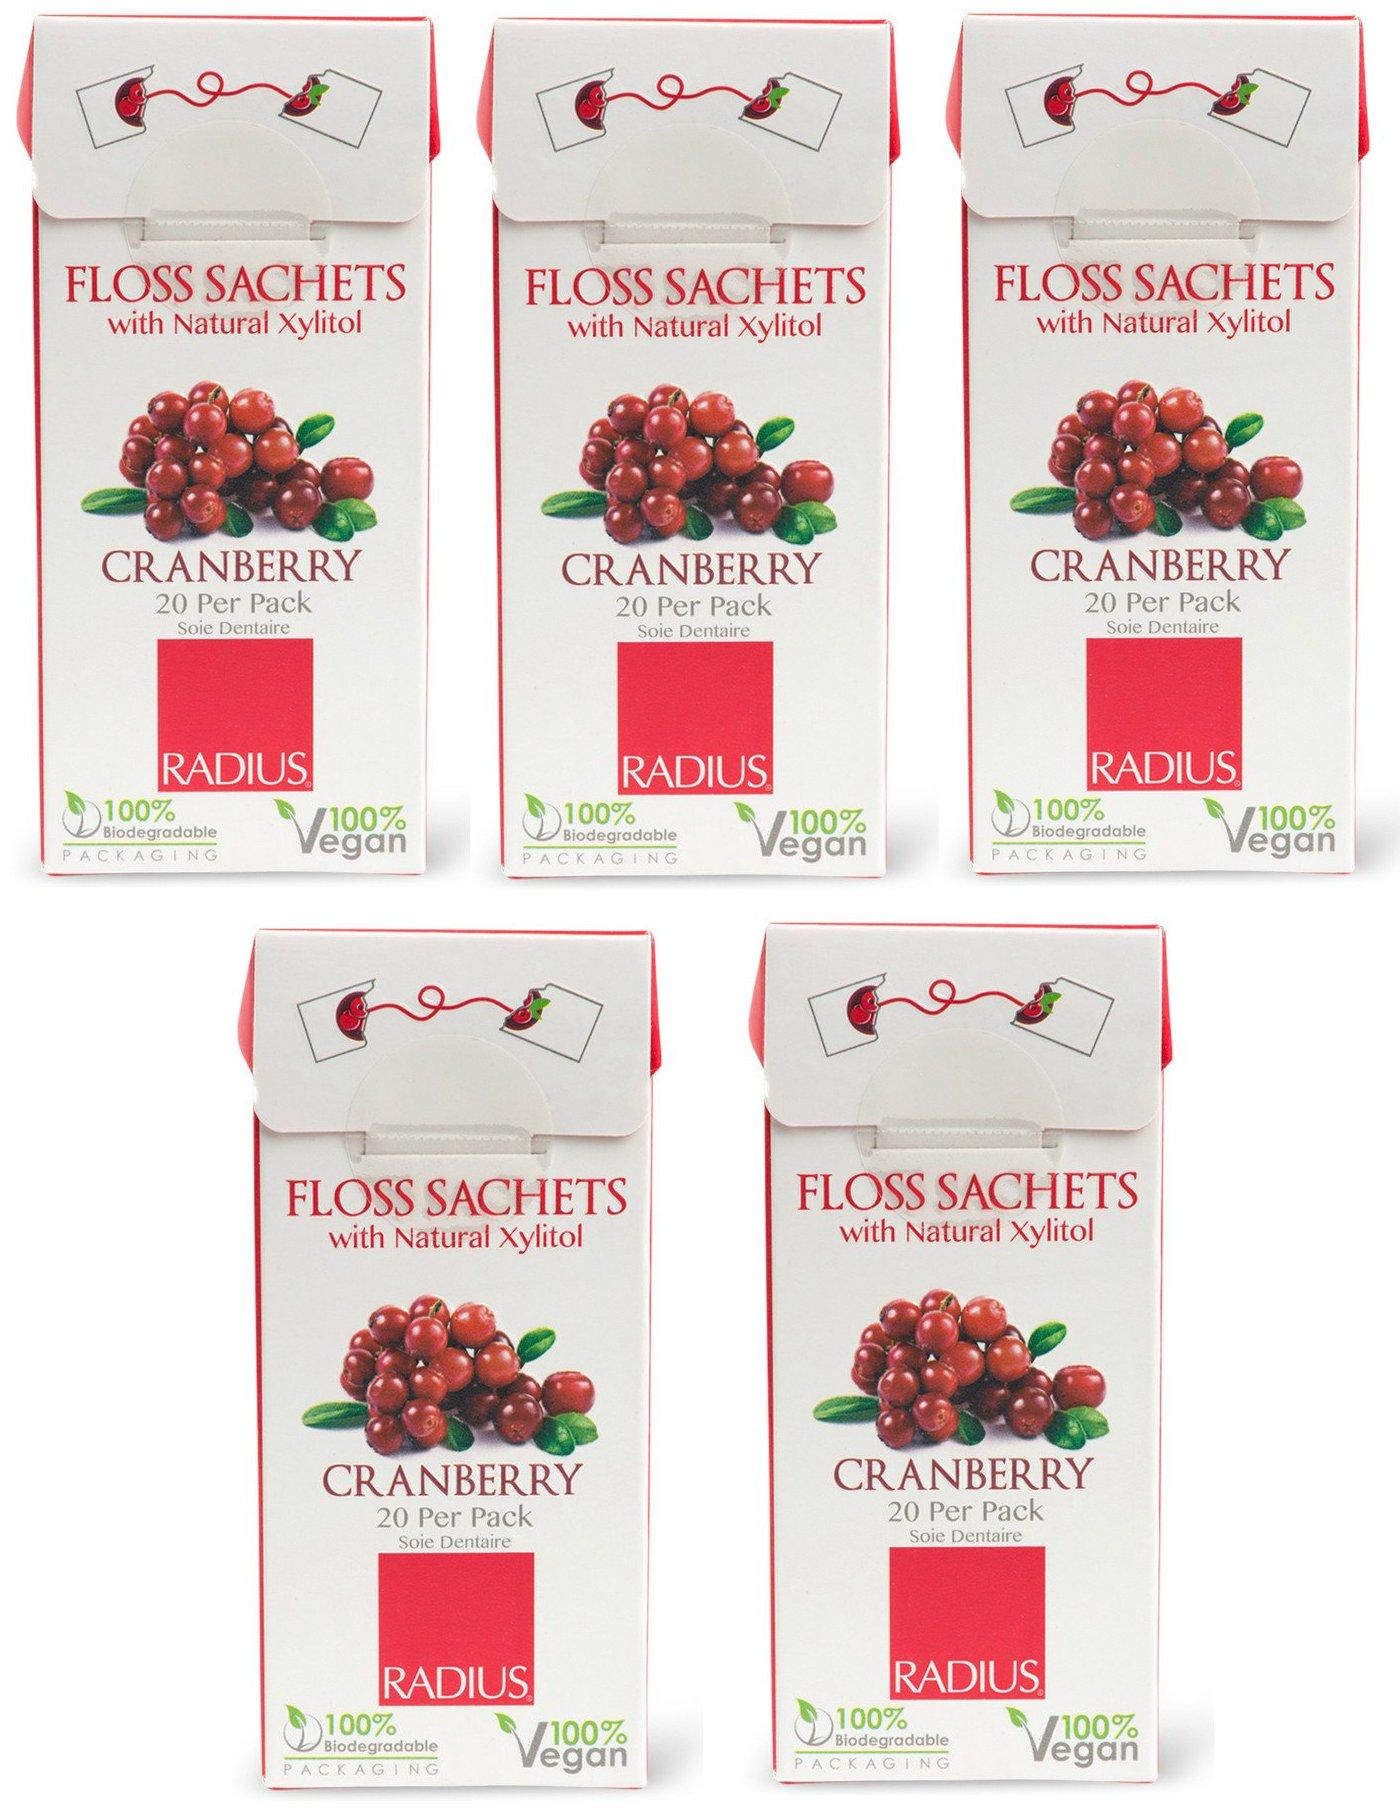 Radius Vegan Xylitol Floss Sachets Cranberry (Pack of 5), 20 sachets per pack